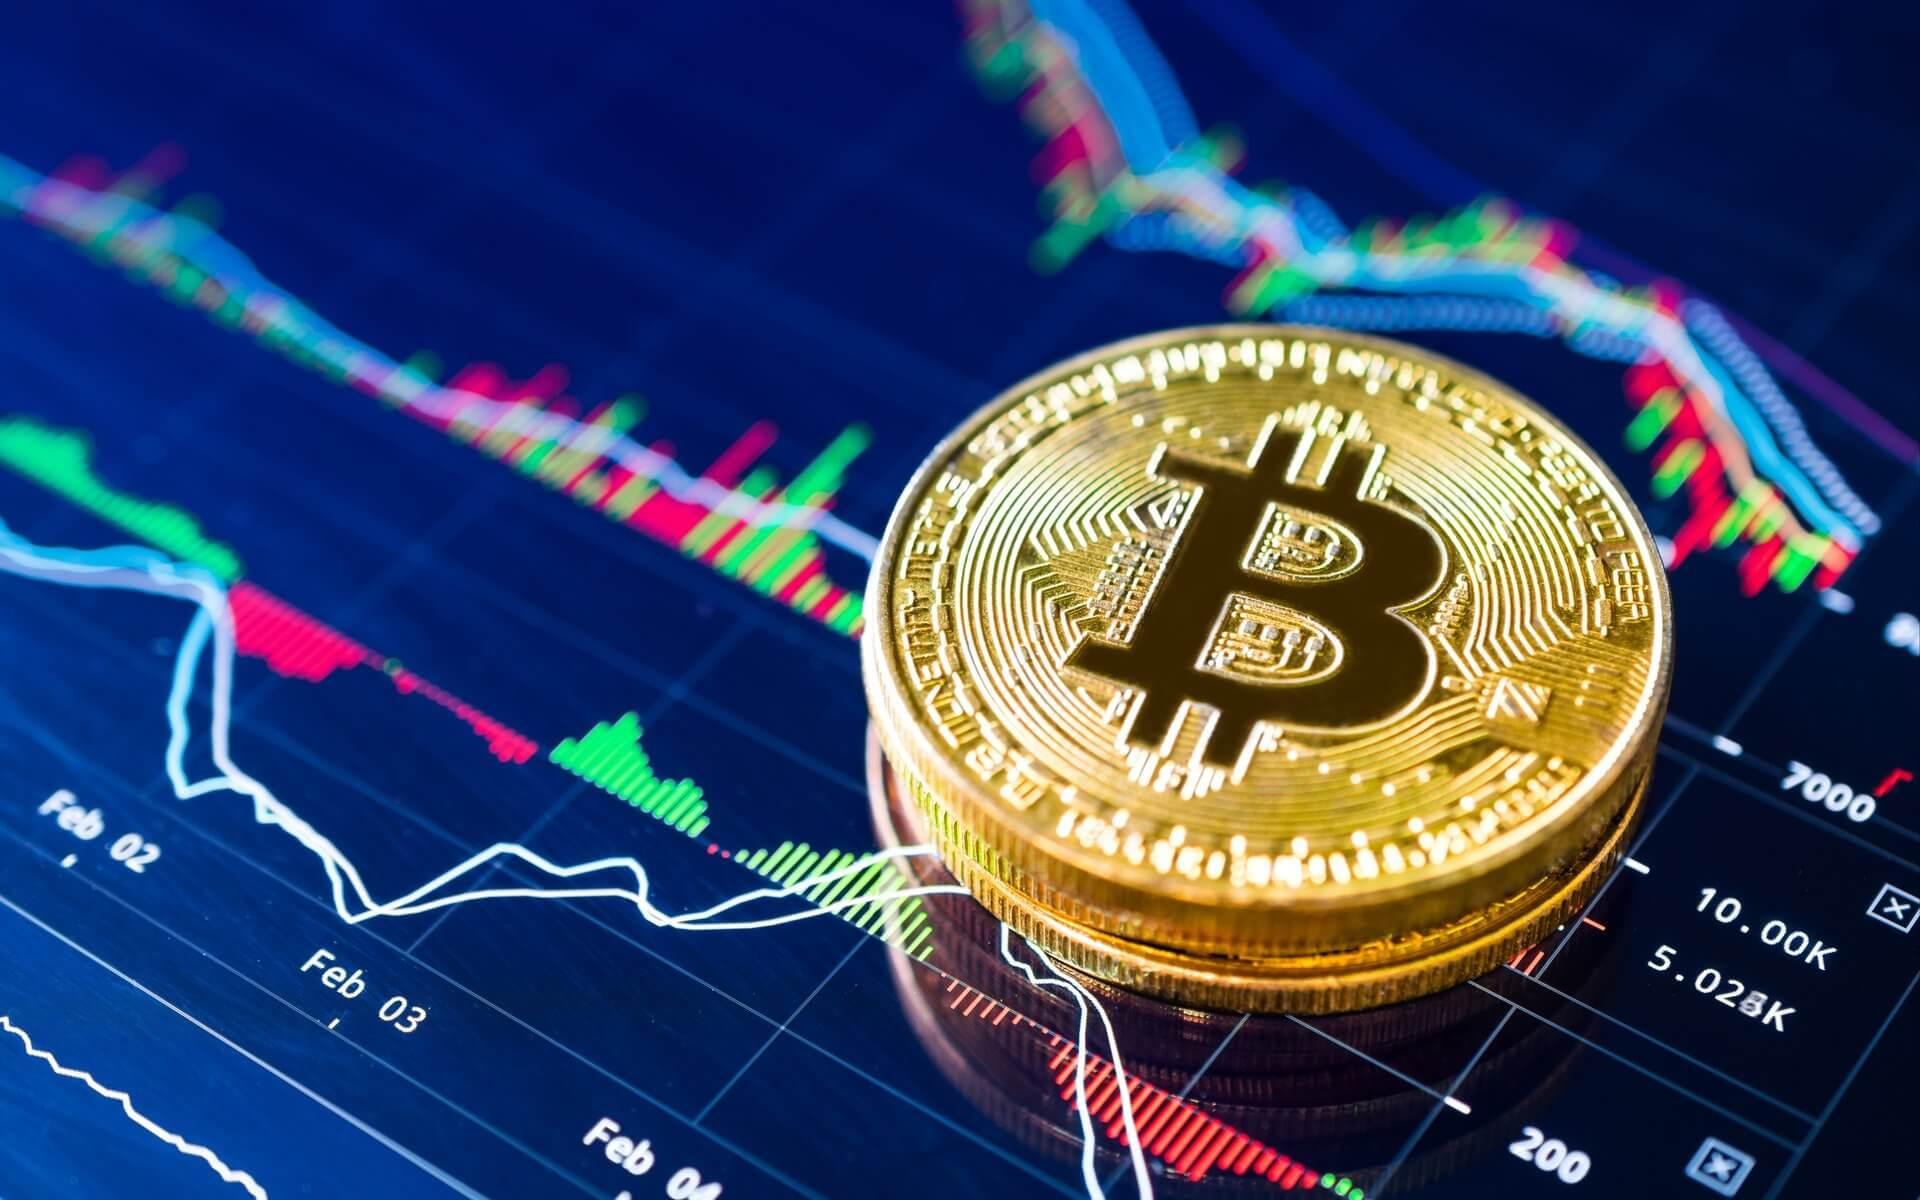 Bitcoinin Hisse Senedi Piyasalari ile Korelasyonu Sifira Dustu